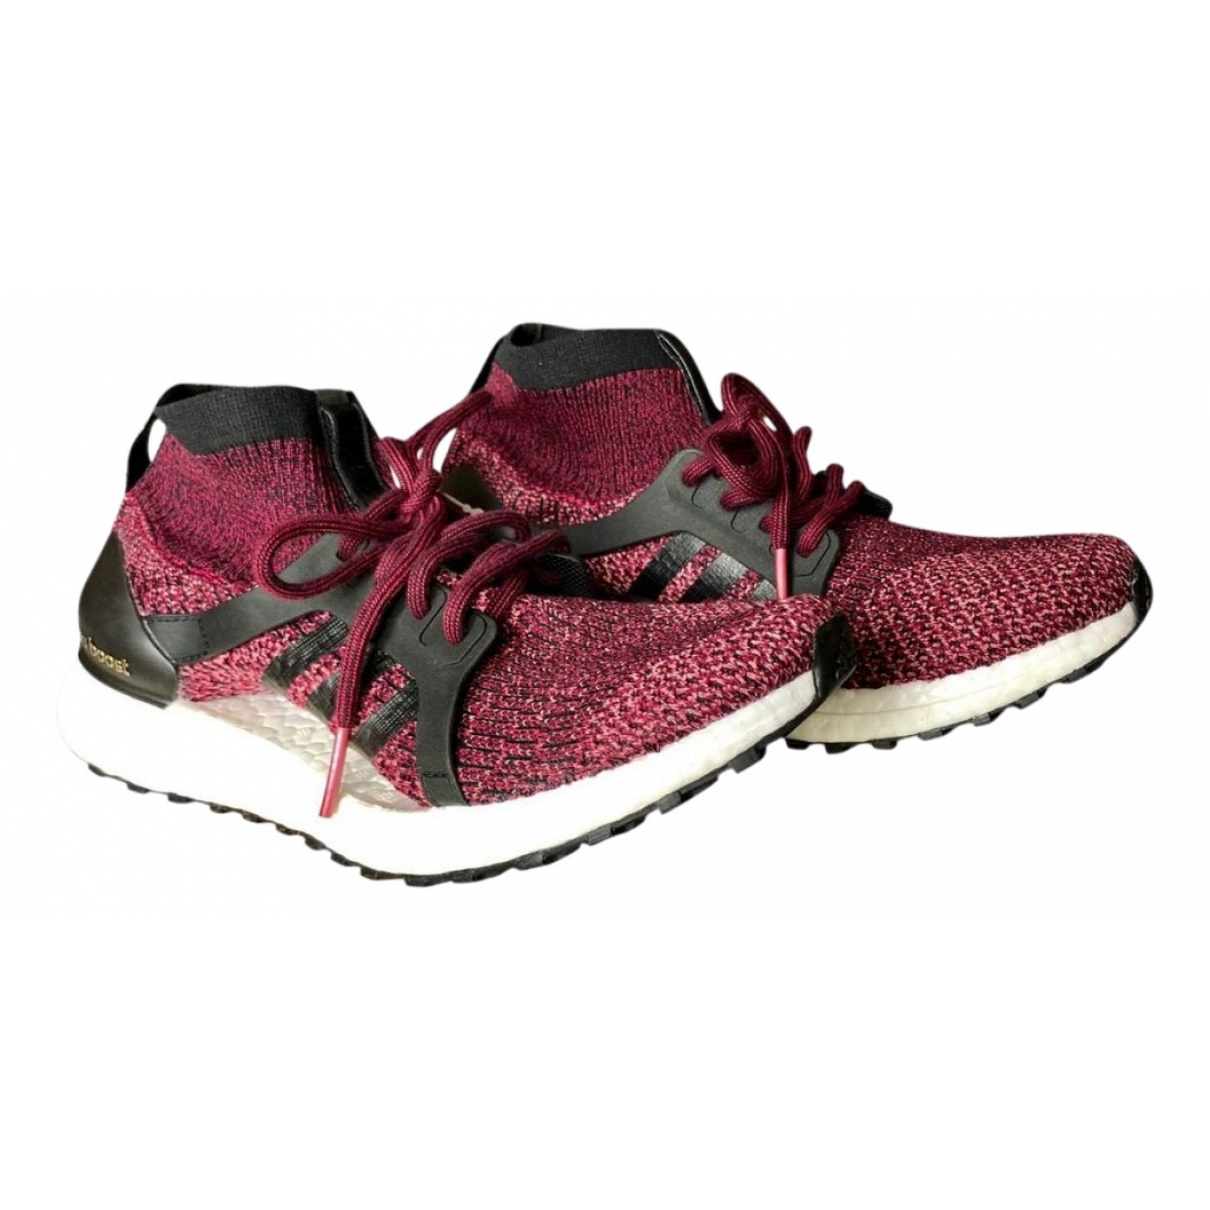 Adidas - Baskets Ultraboost pour femme - violet